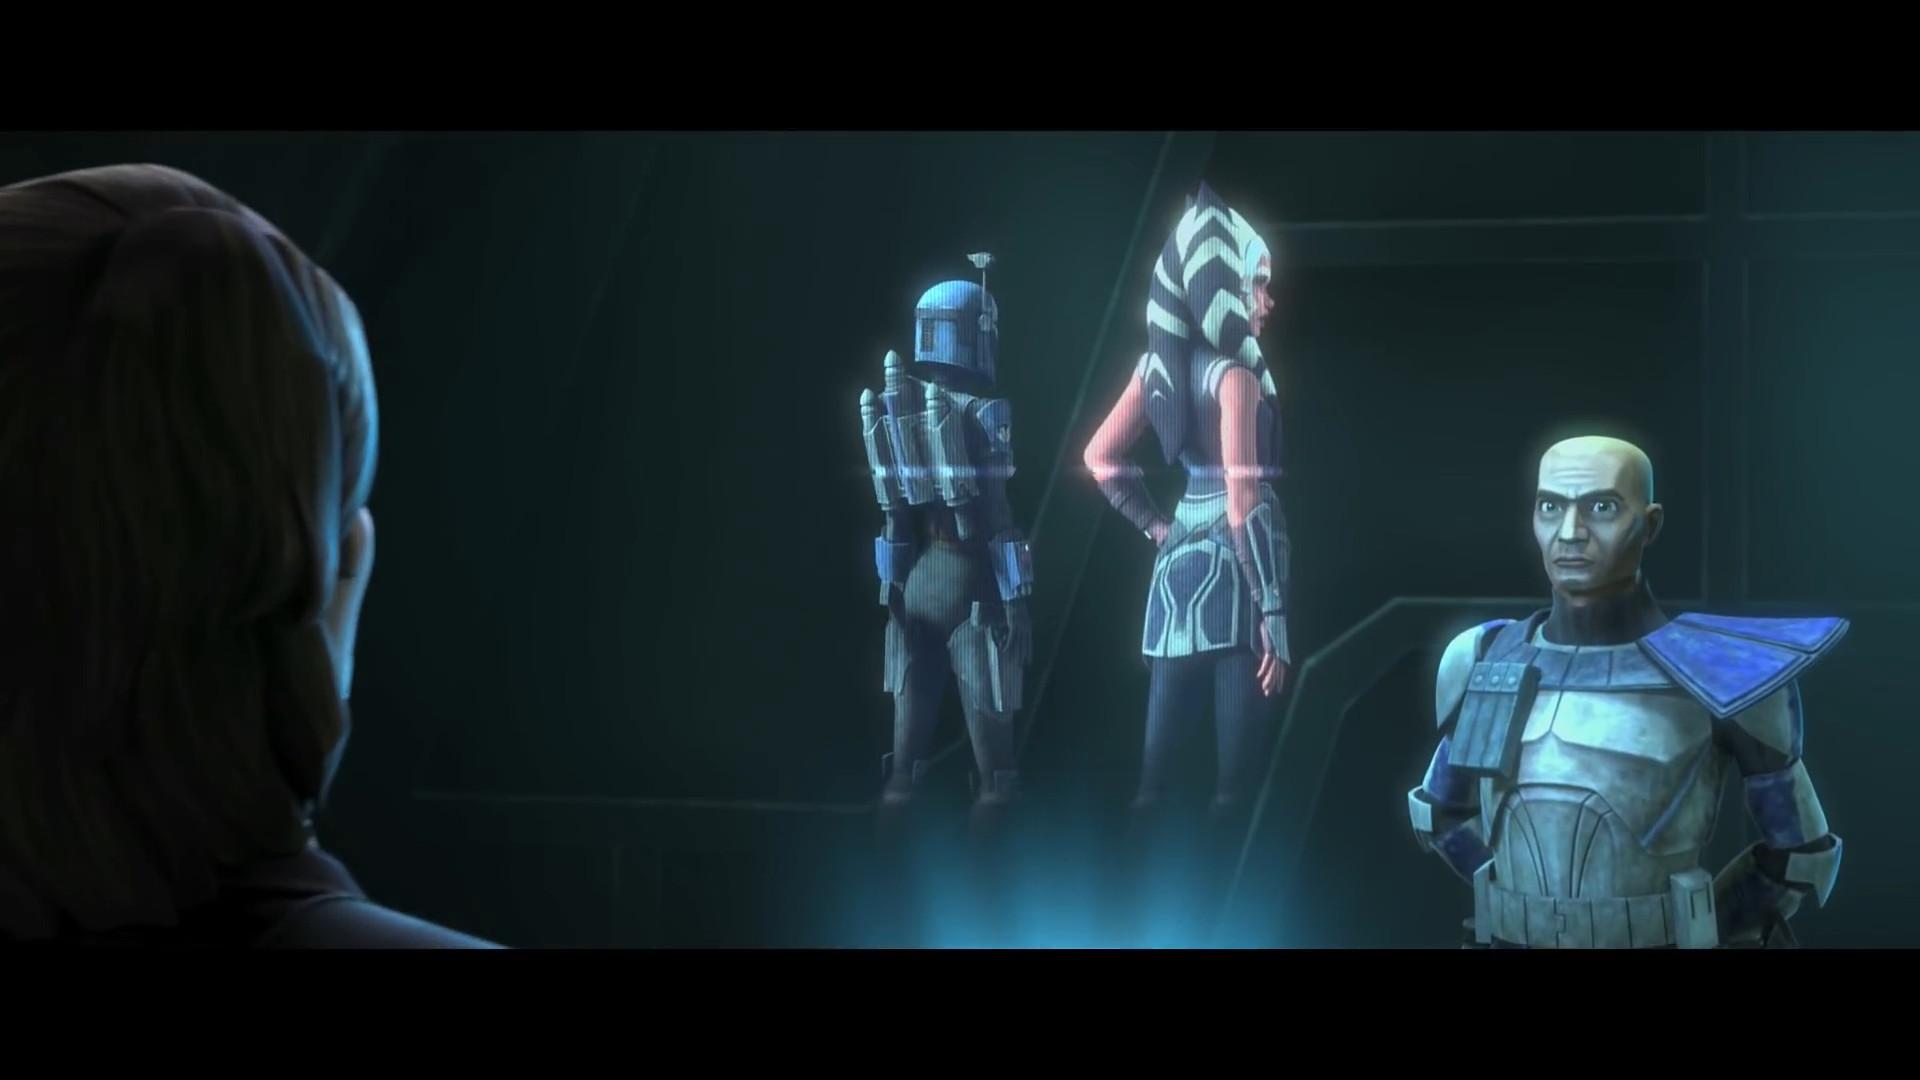 clone-wars-saved-trailer-05